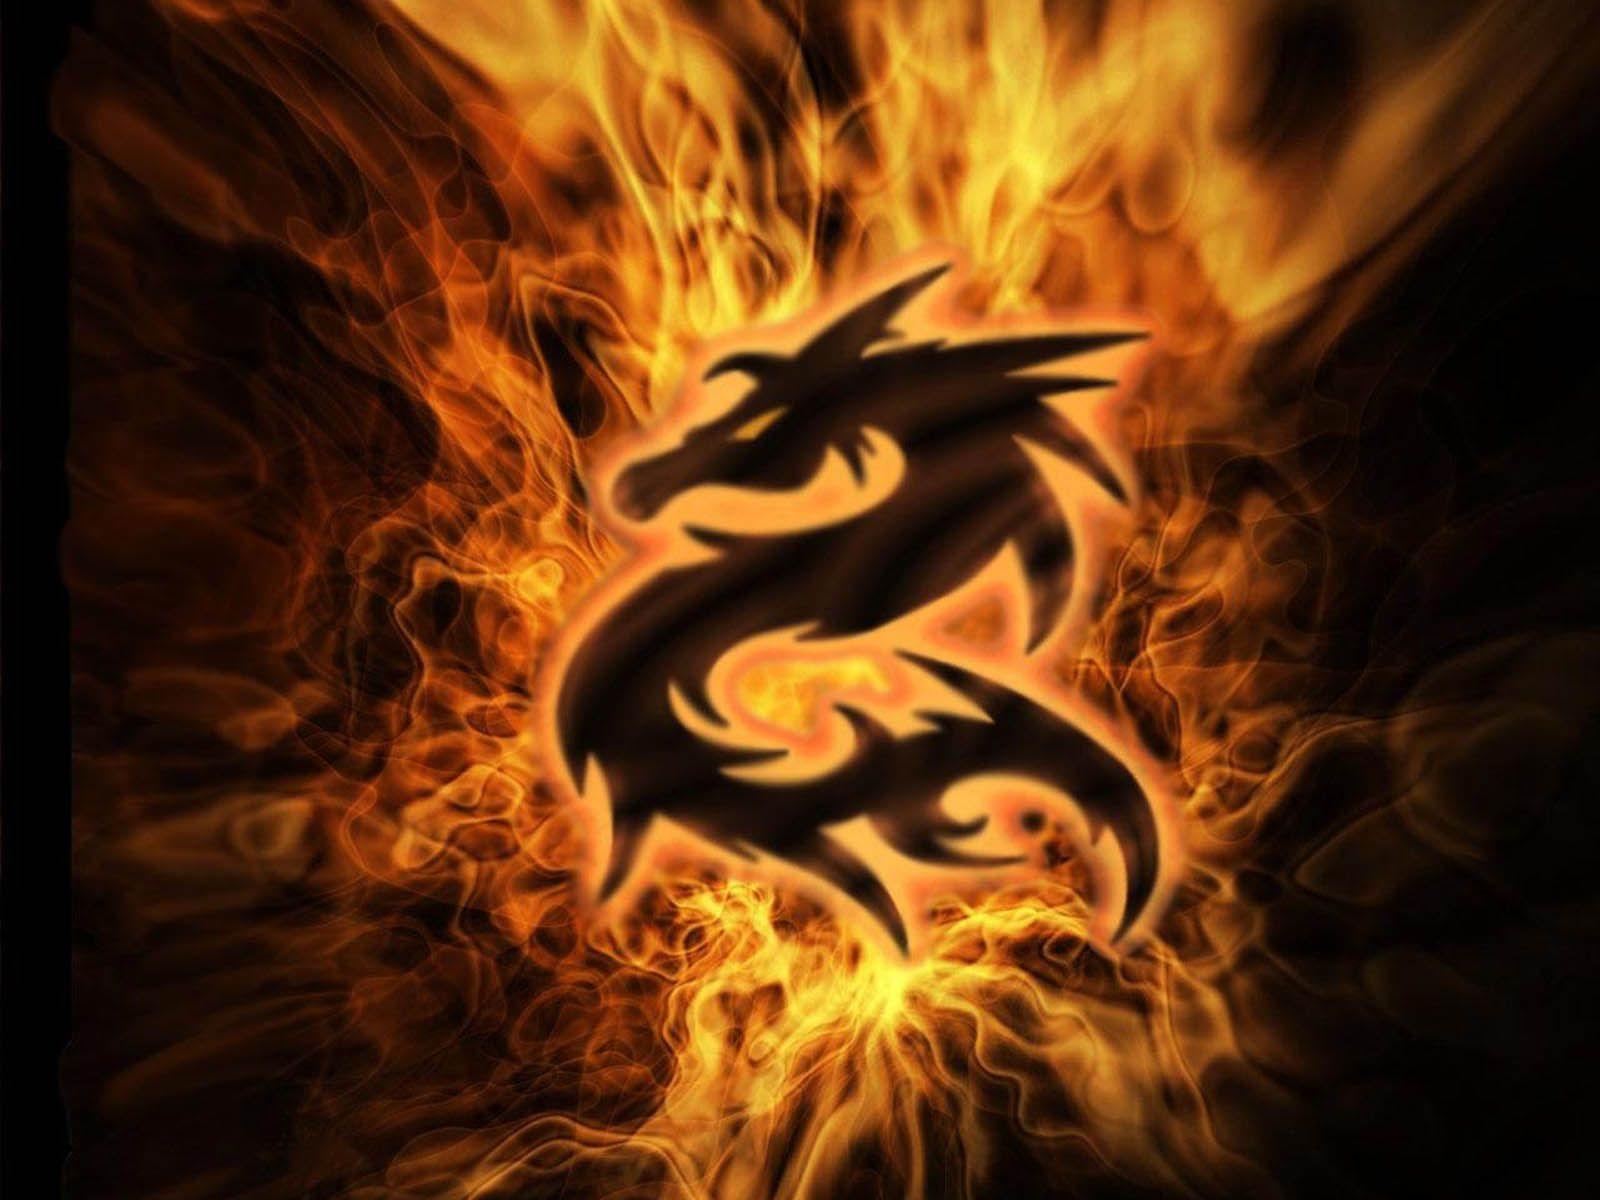 free dragons wallpaper | hd wallpapers | pinterest | wallpaper